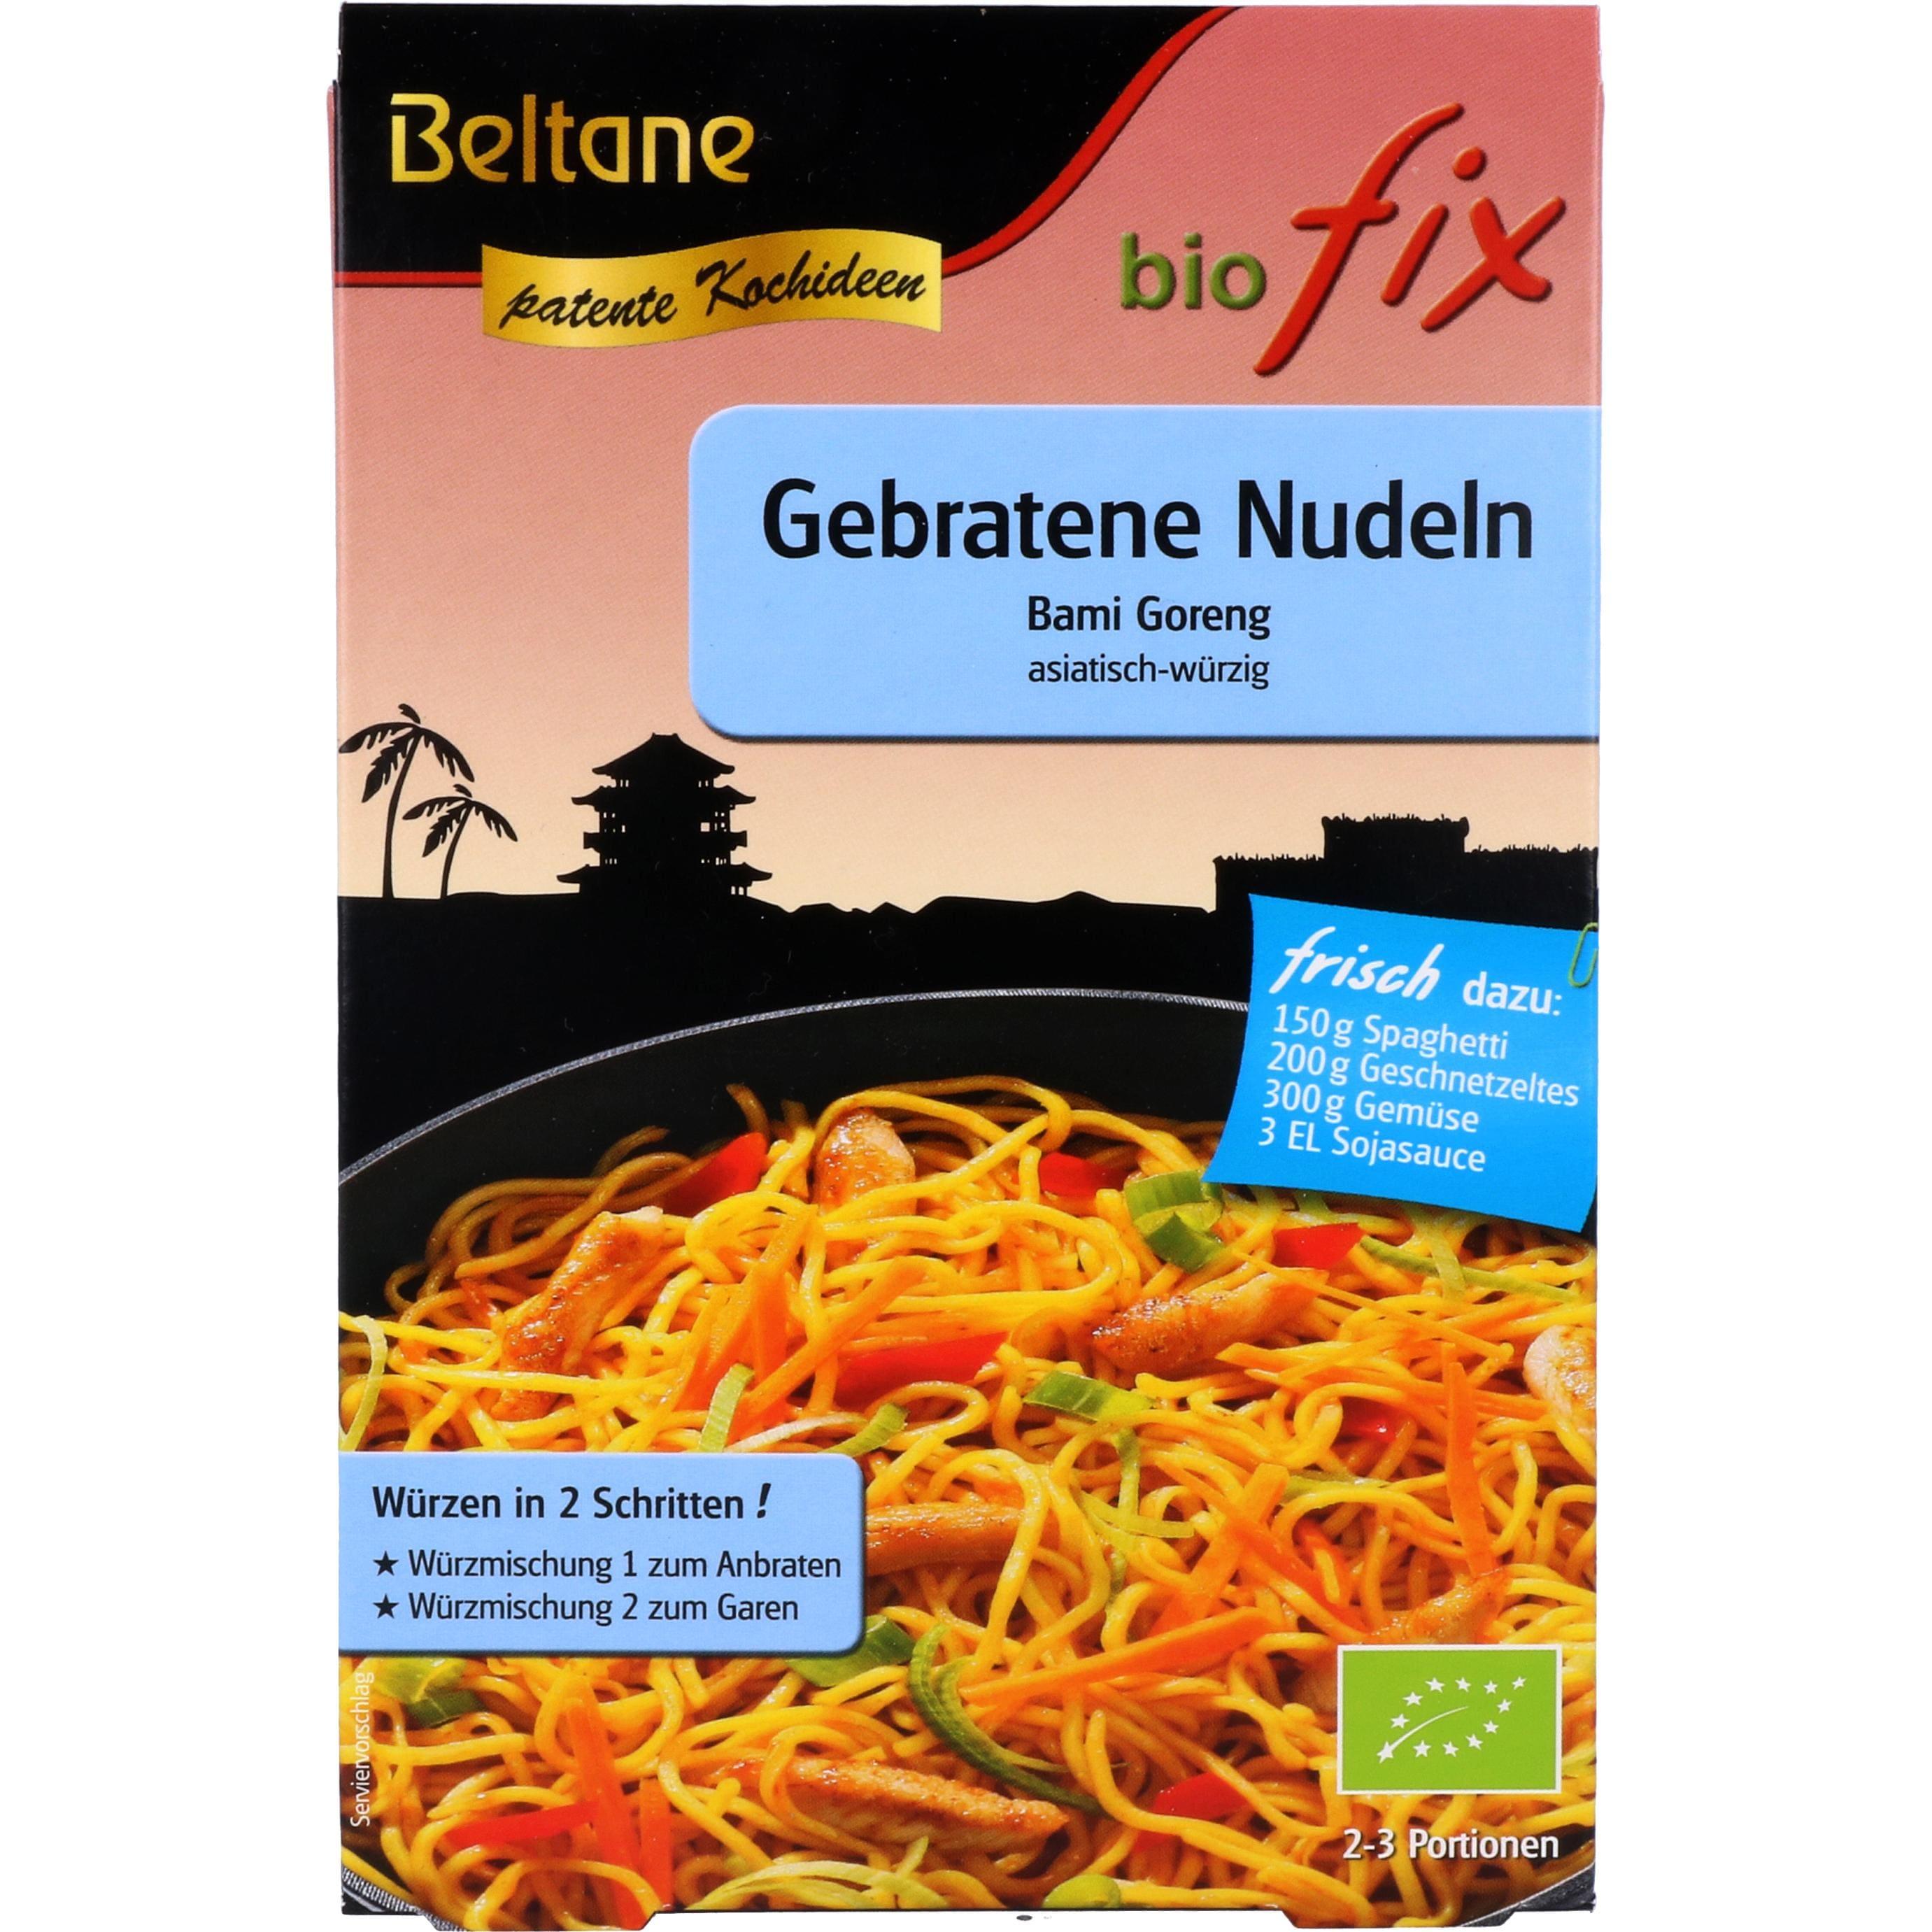 Beltane Bio Fix Gebratene Nudeln 16g